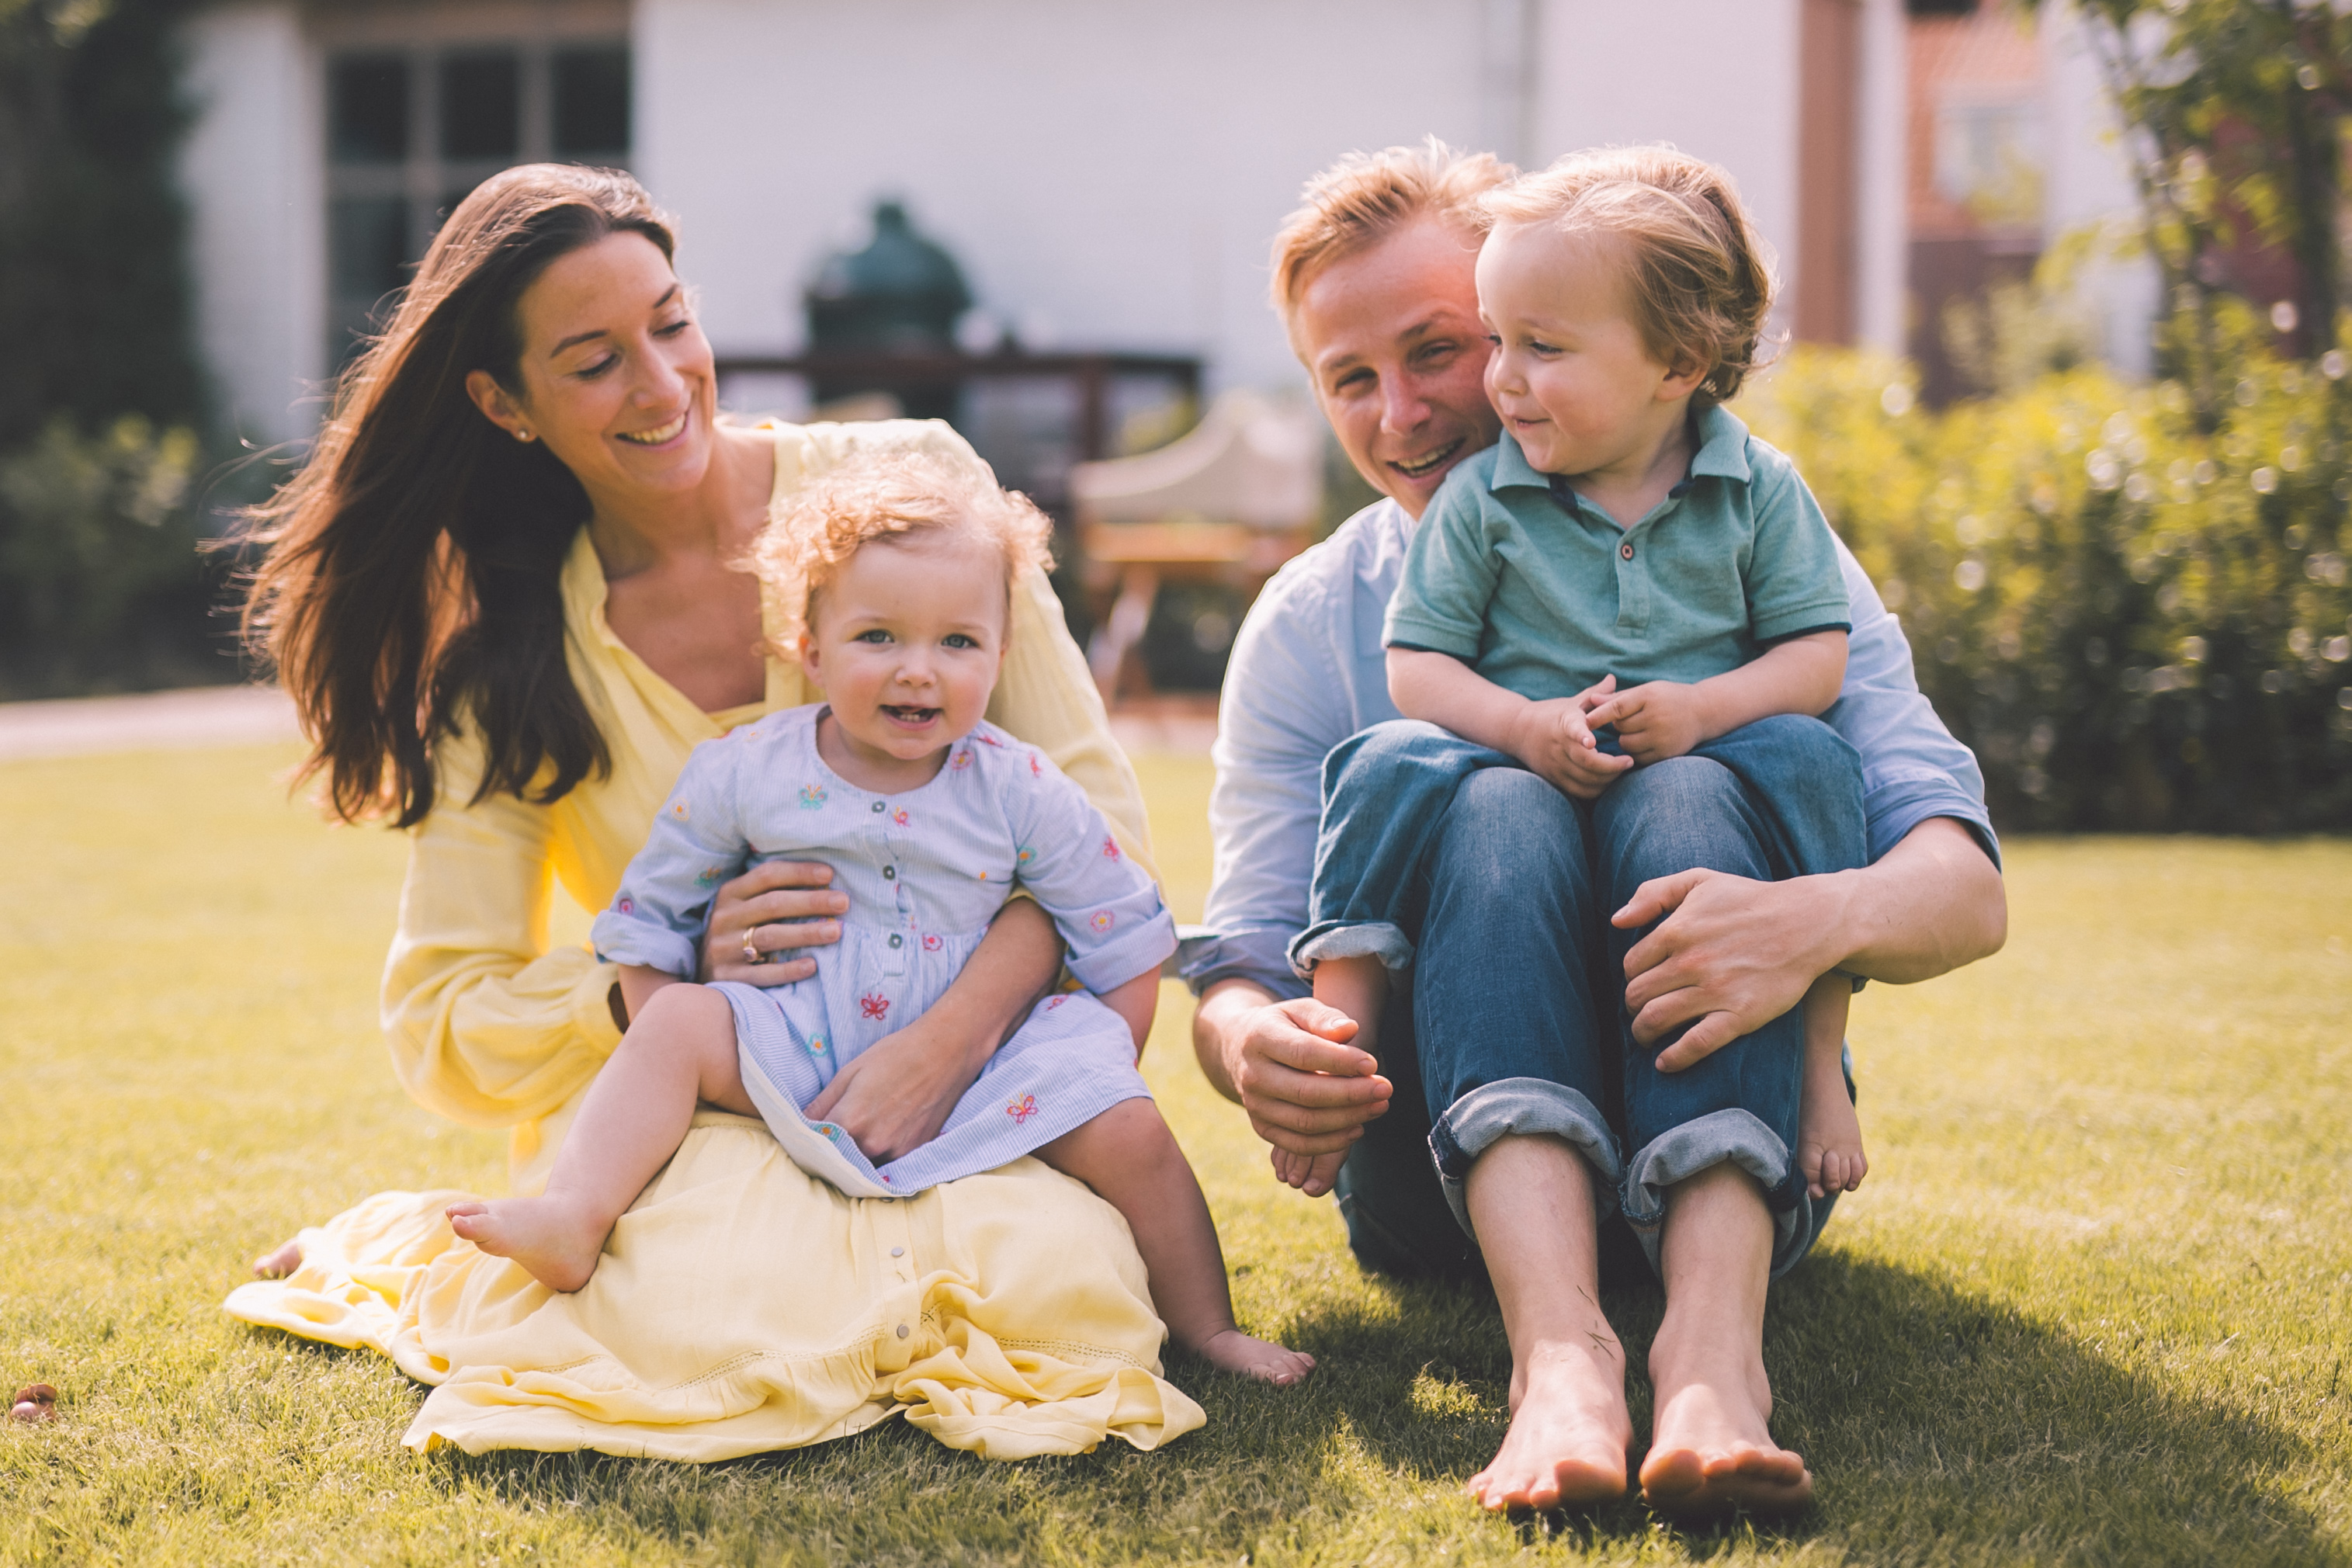 FAMILIE DE MULDER-4918